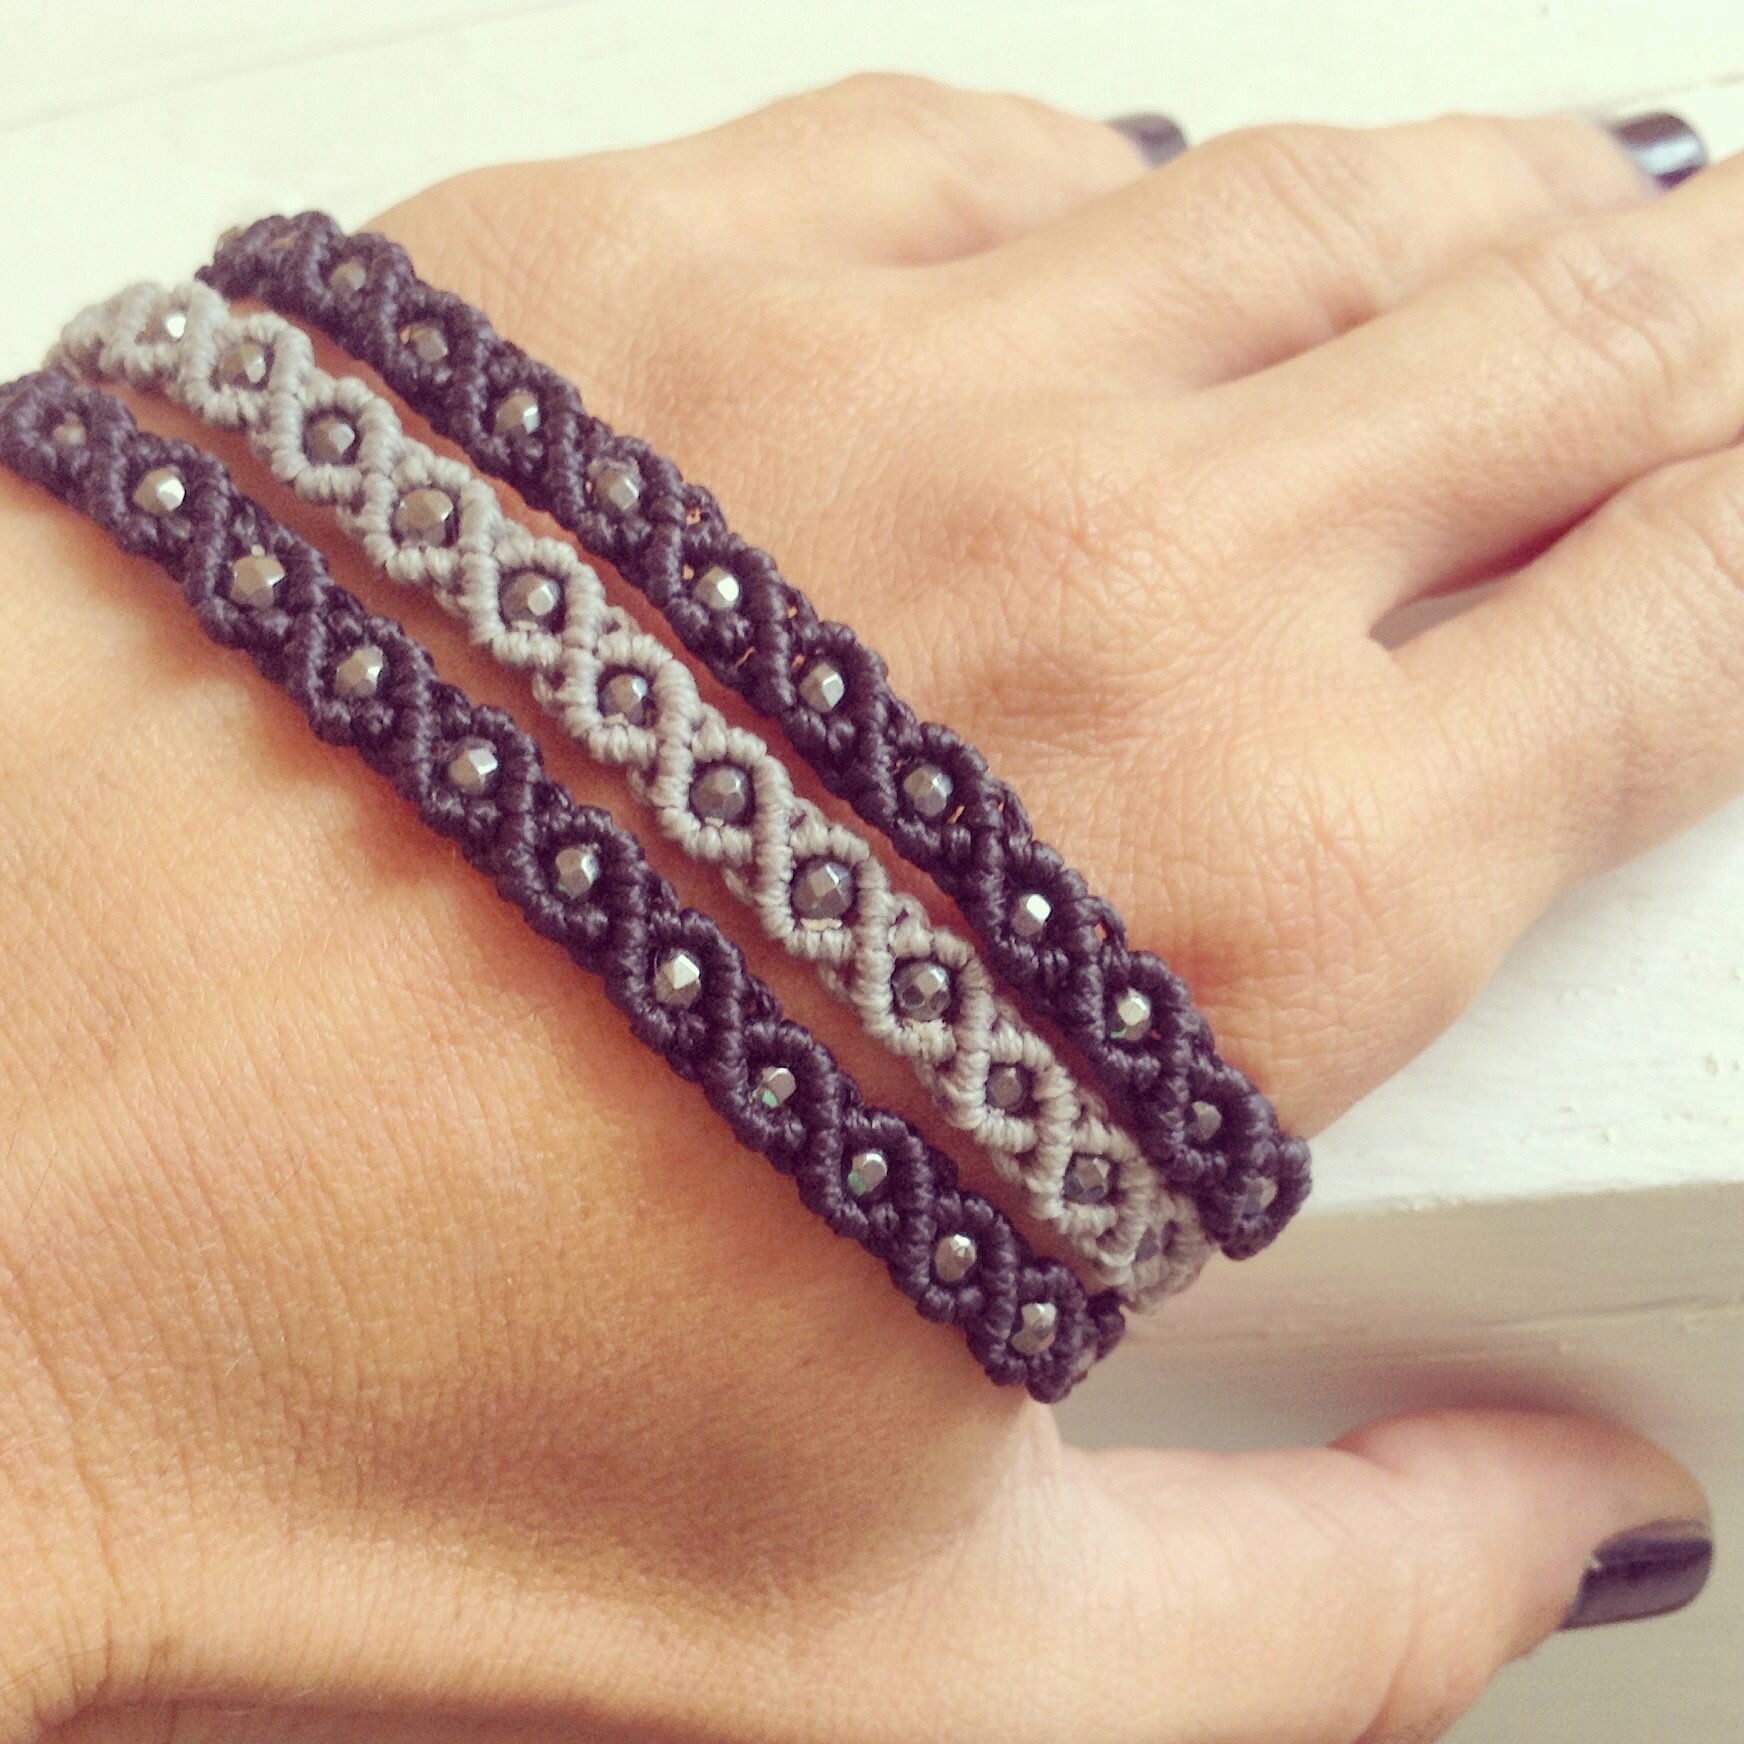 semi precious bracelets macrame bracelets pinterest bracelet macram macram et bijoux. Black Bedroom Furniture Sets. Home Design Ideas